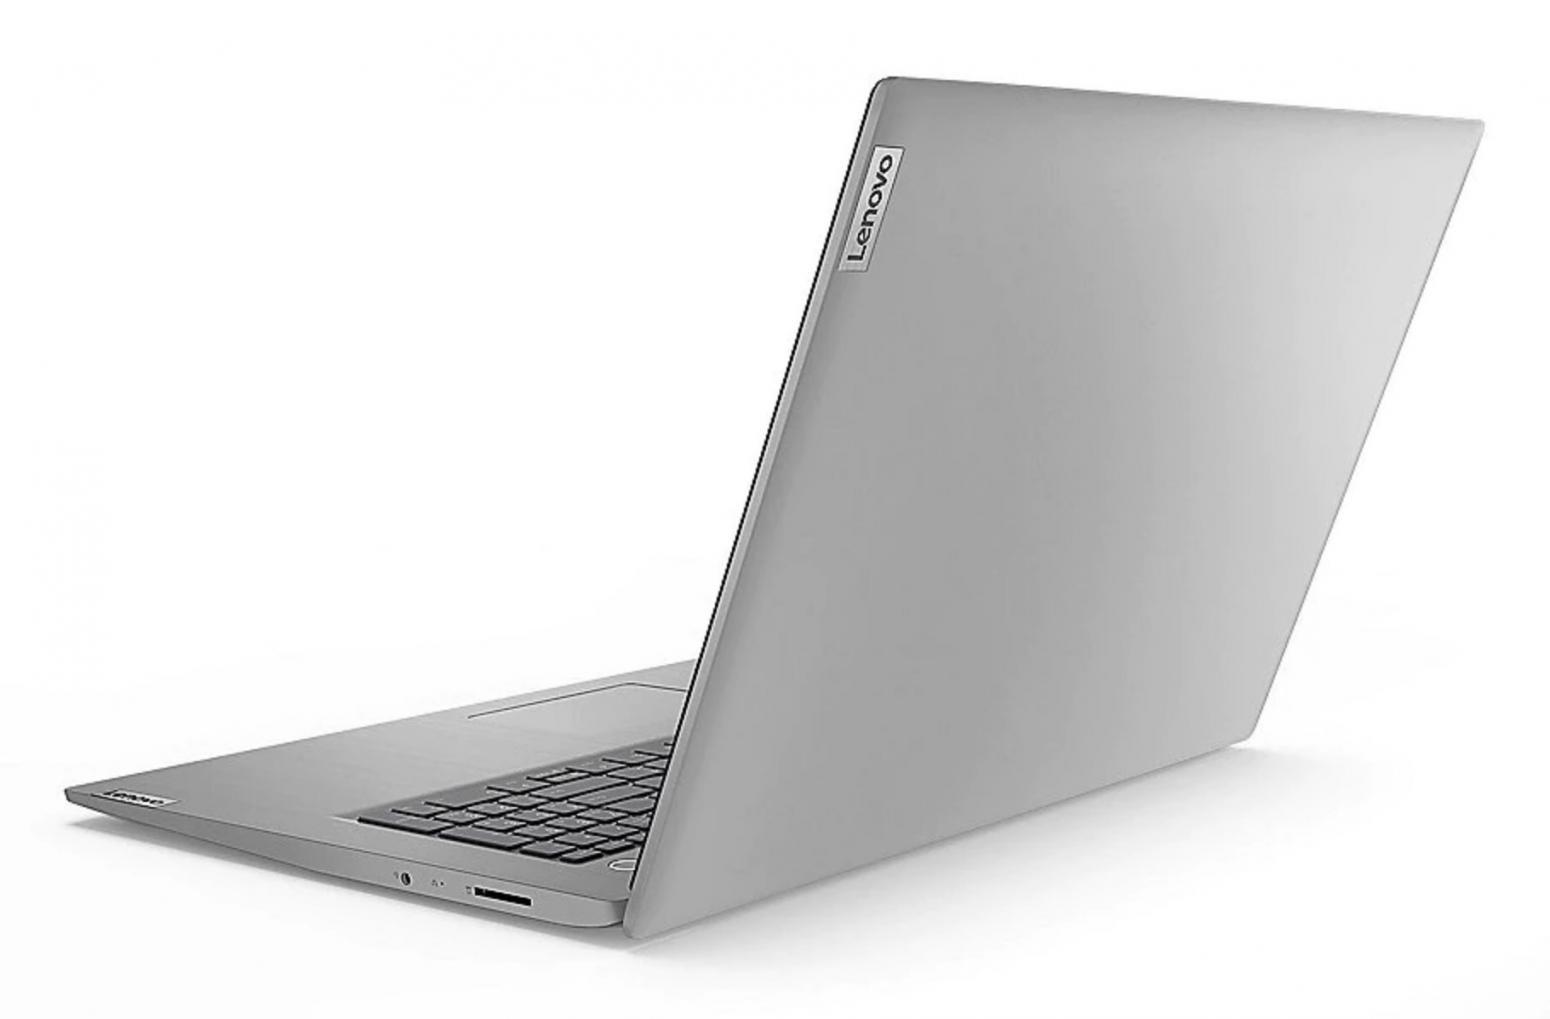 Ordinateur portable Lenovo IdeaPad 3 17IIL05 (81WF001SFR) Argent - photo 3